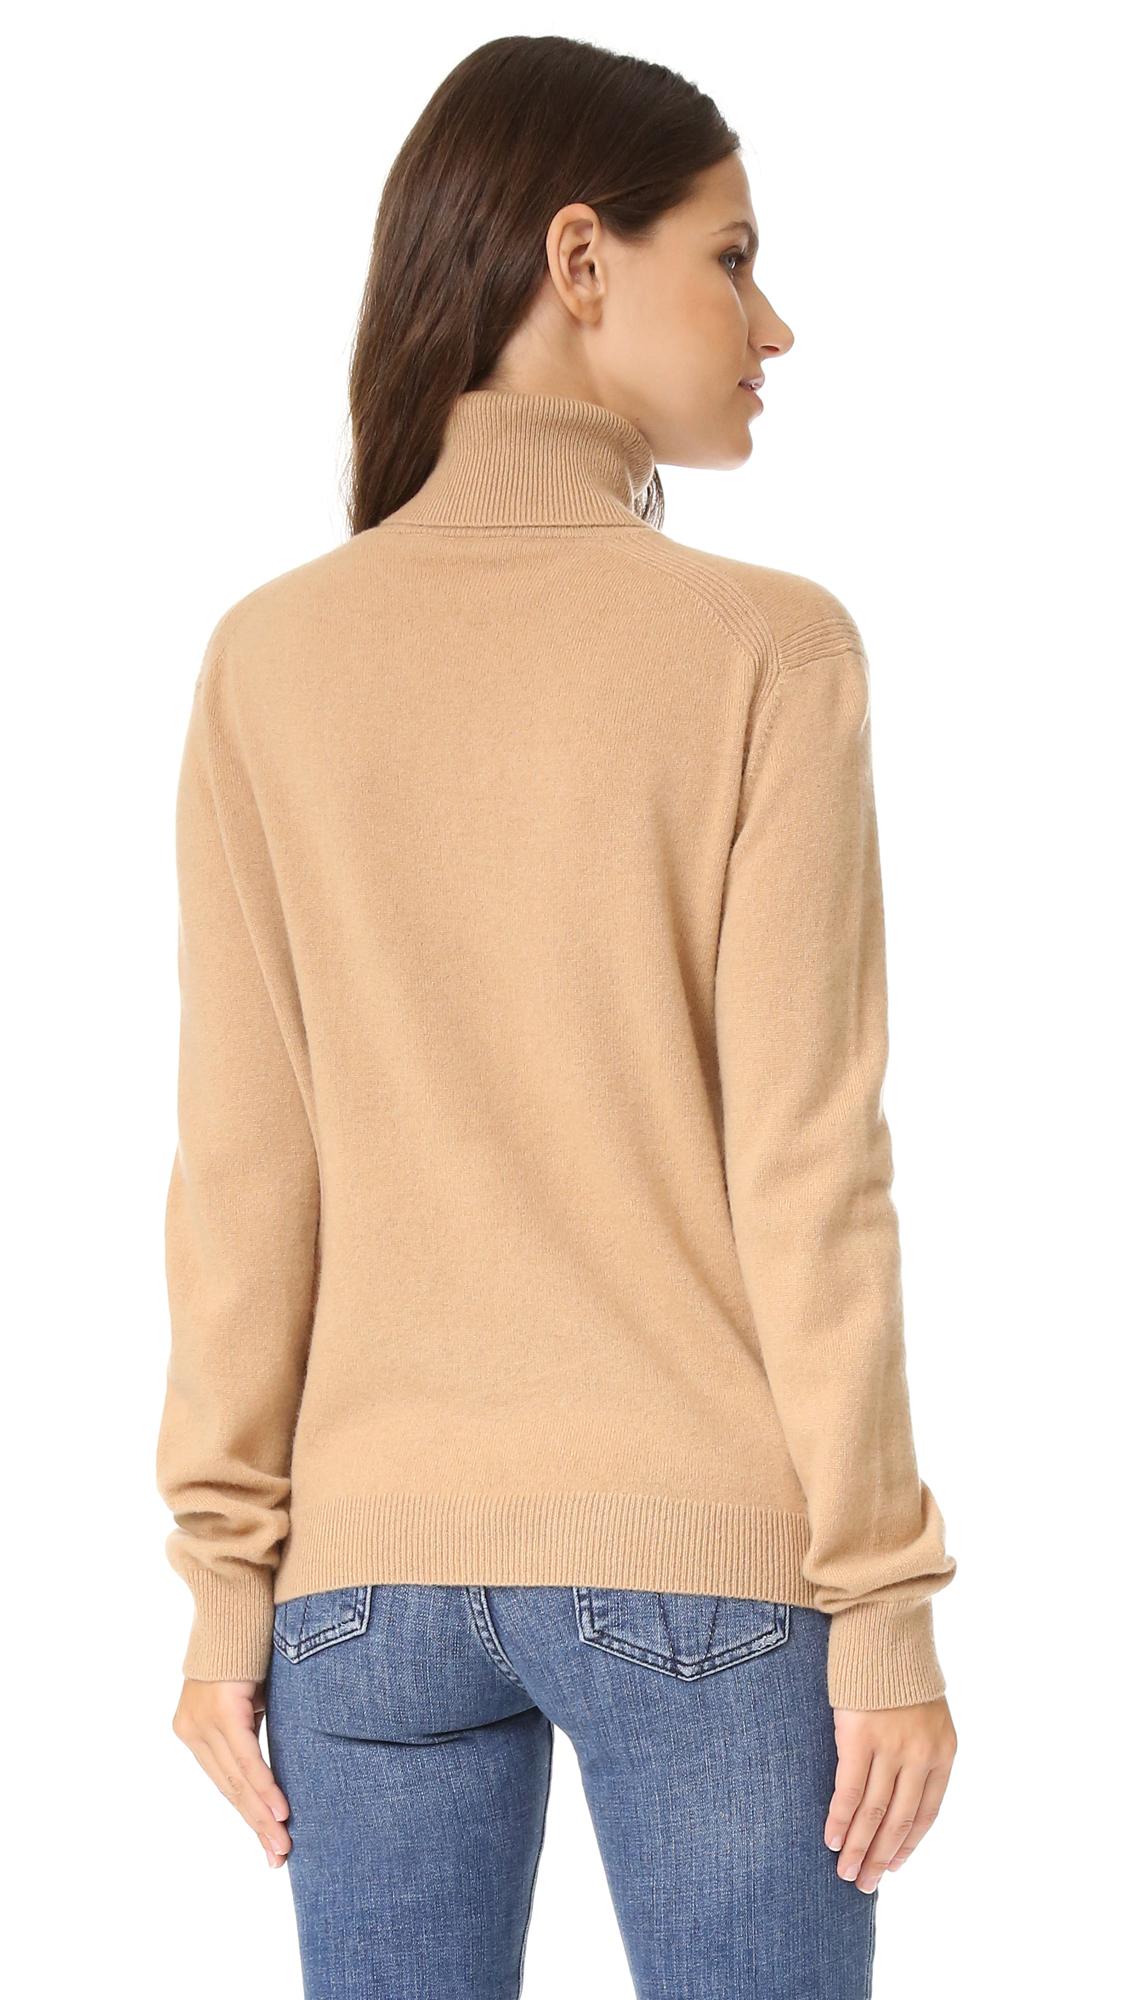 7b4bac256647 Vince Cashmere Turtleneck Sweater